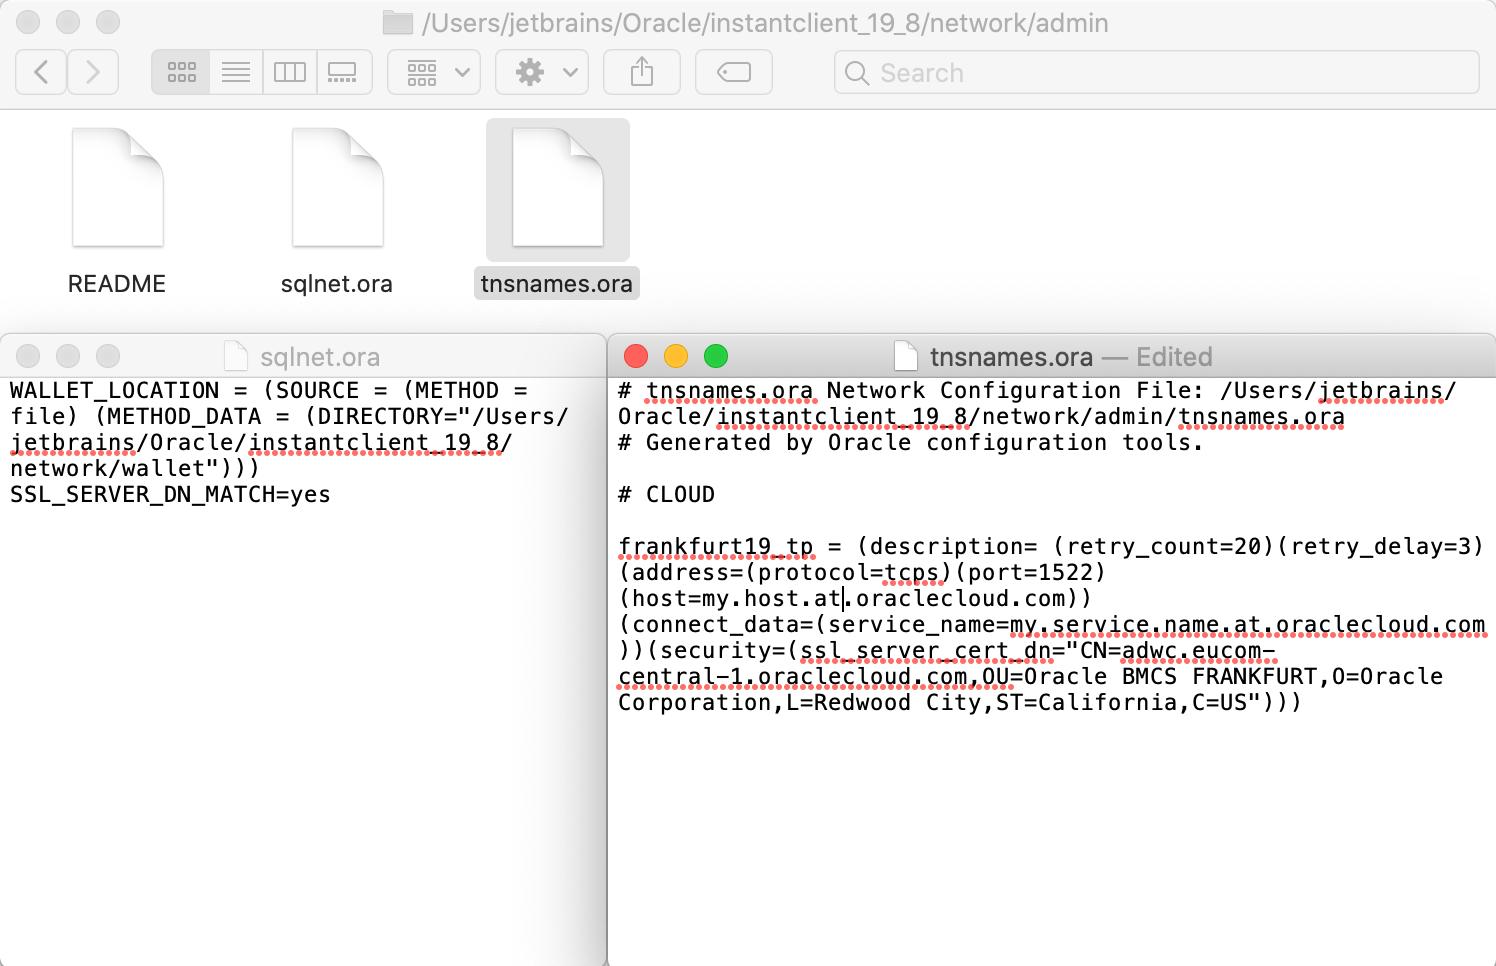 Configuring TNS files